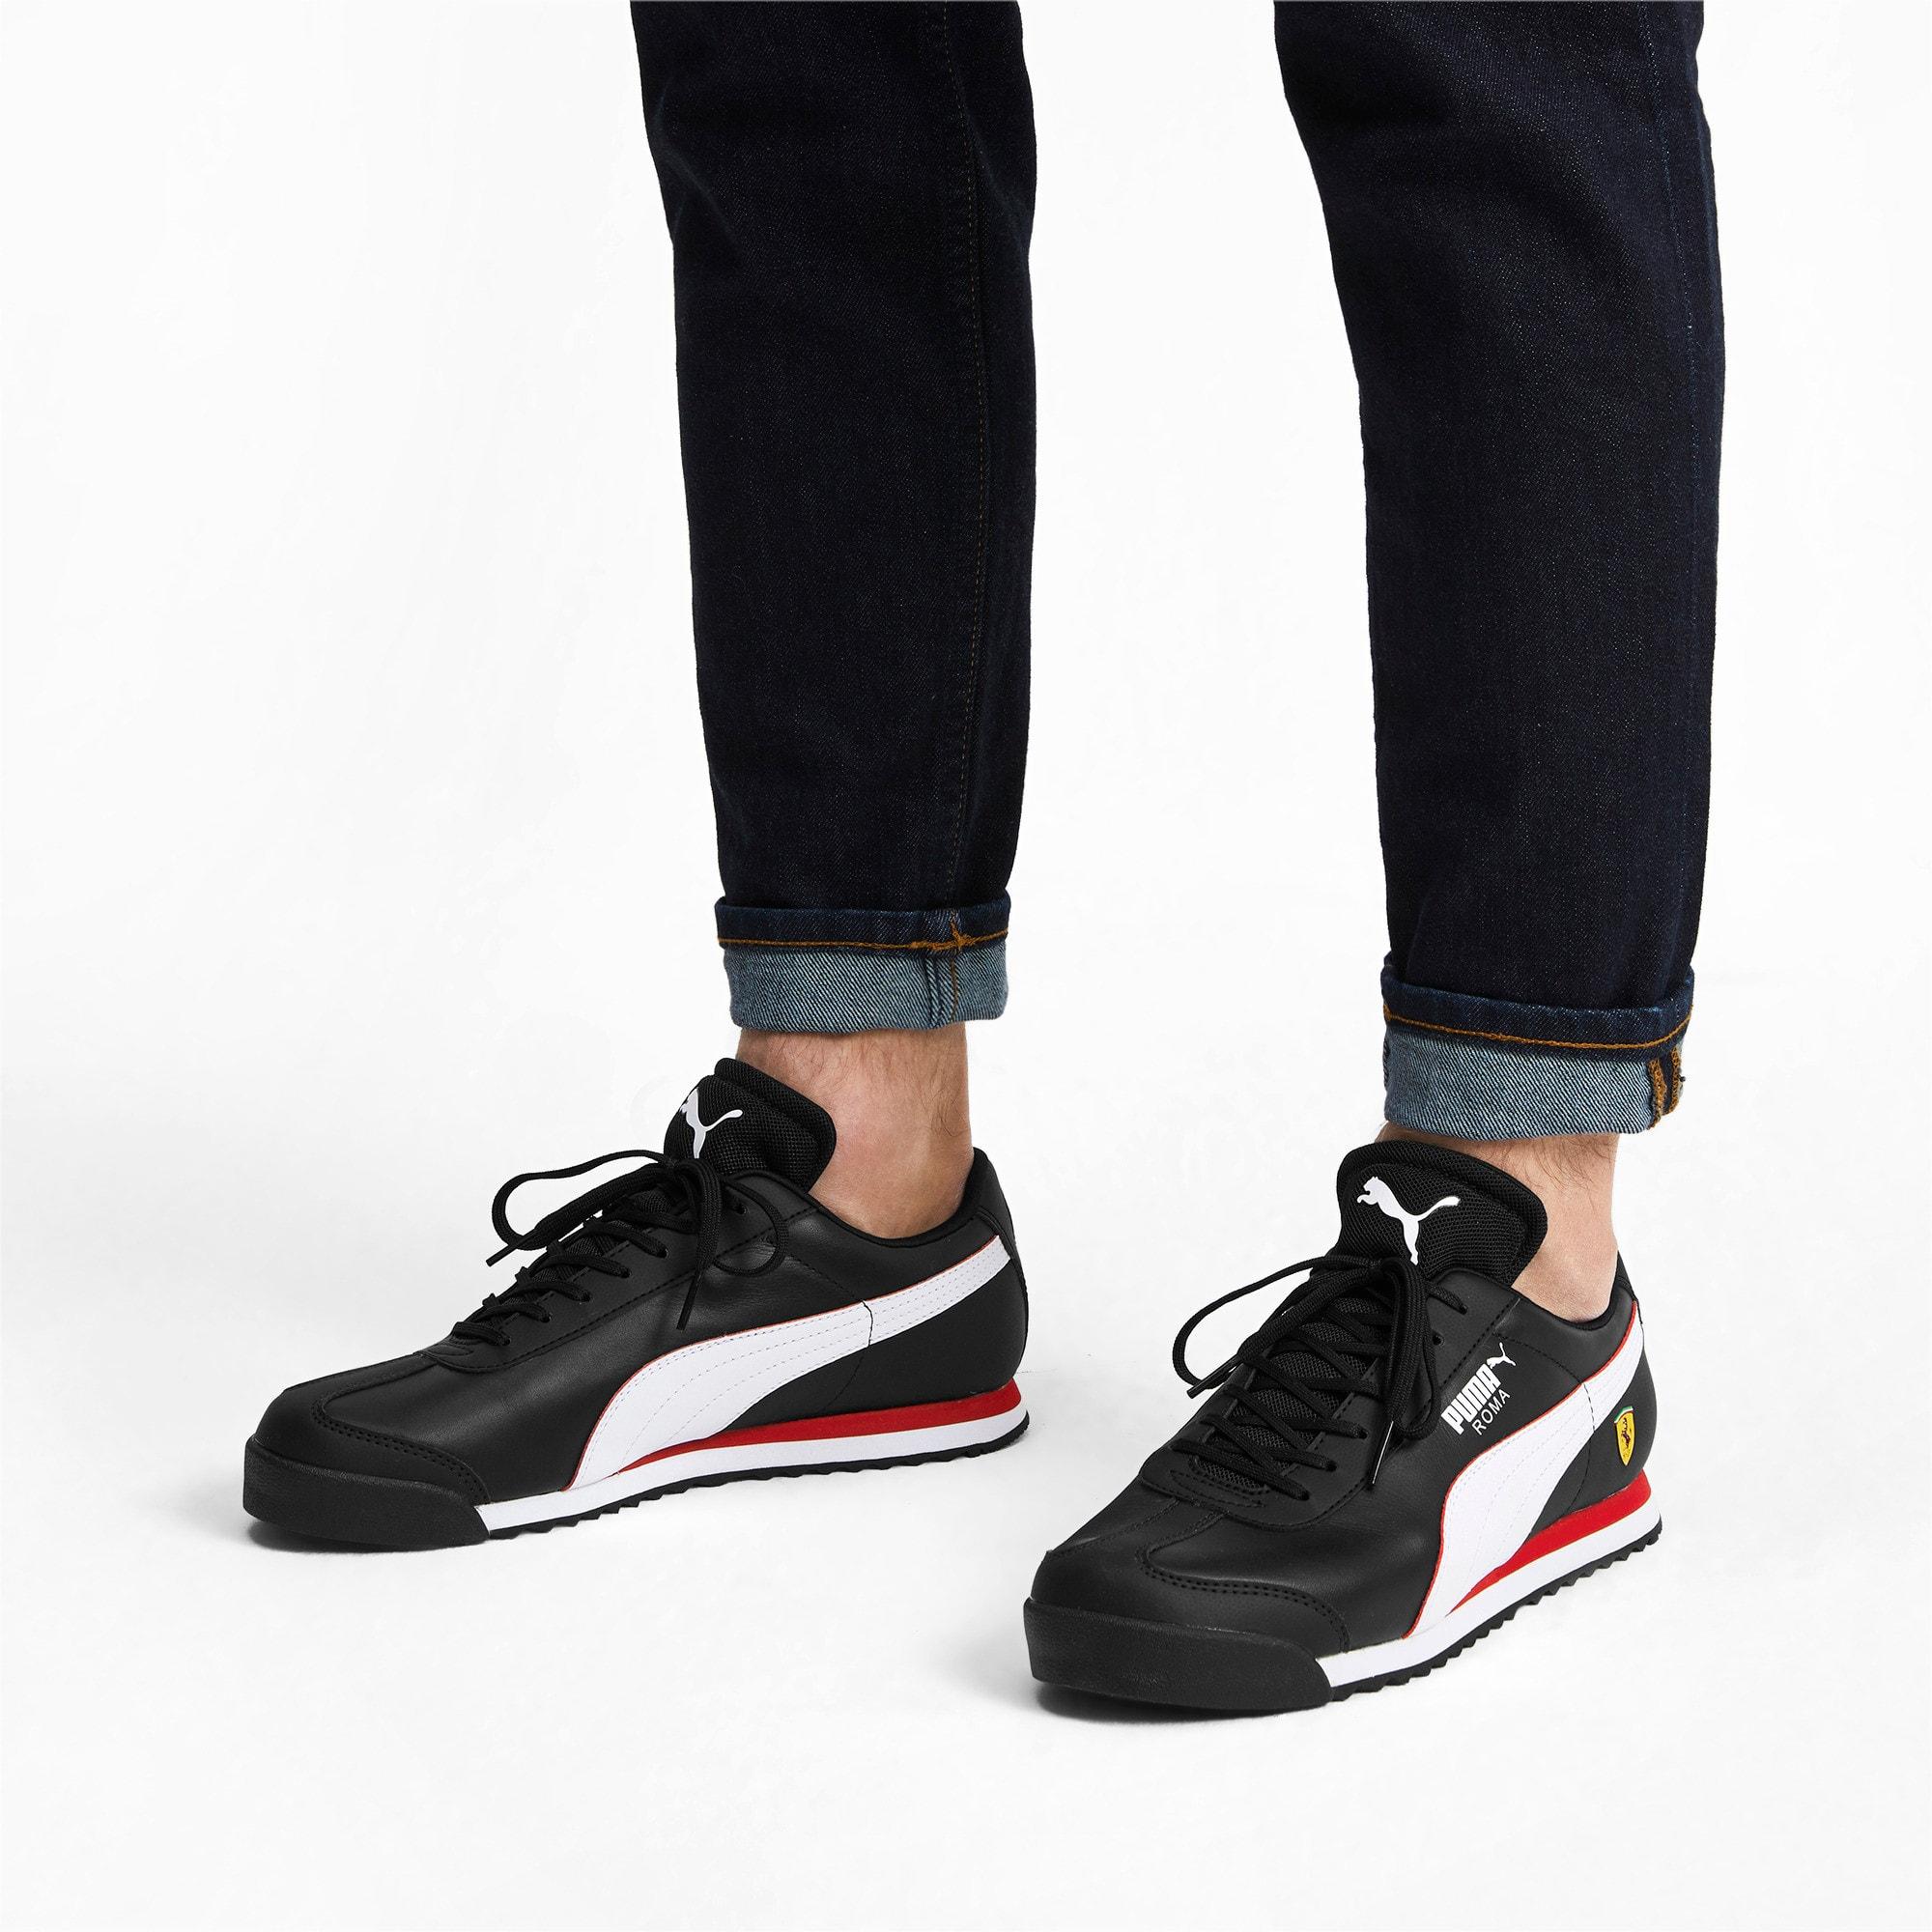 Thumbnail 2 of Scuderia Ferrari Roma Men's Sneakers, Black-White-Rosso Corsa, medium